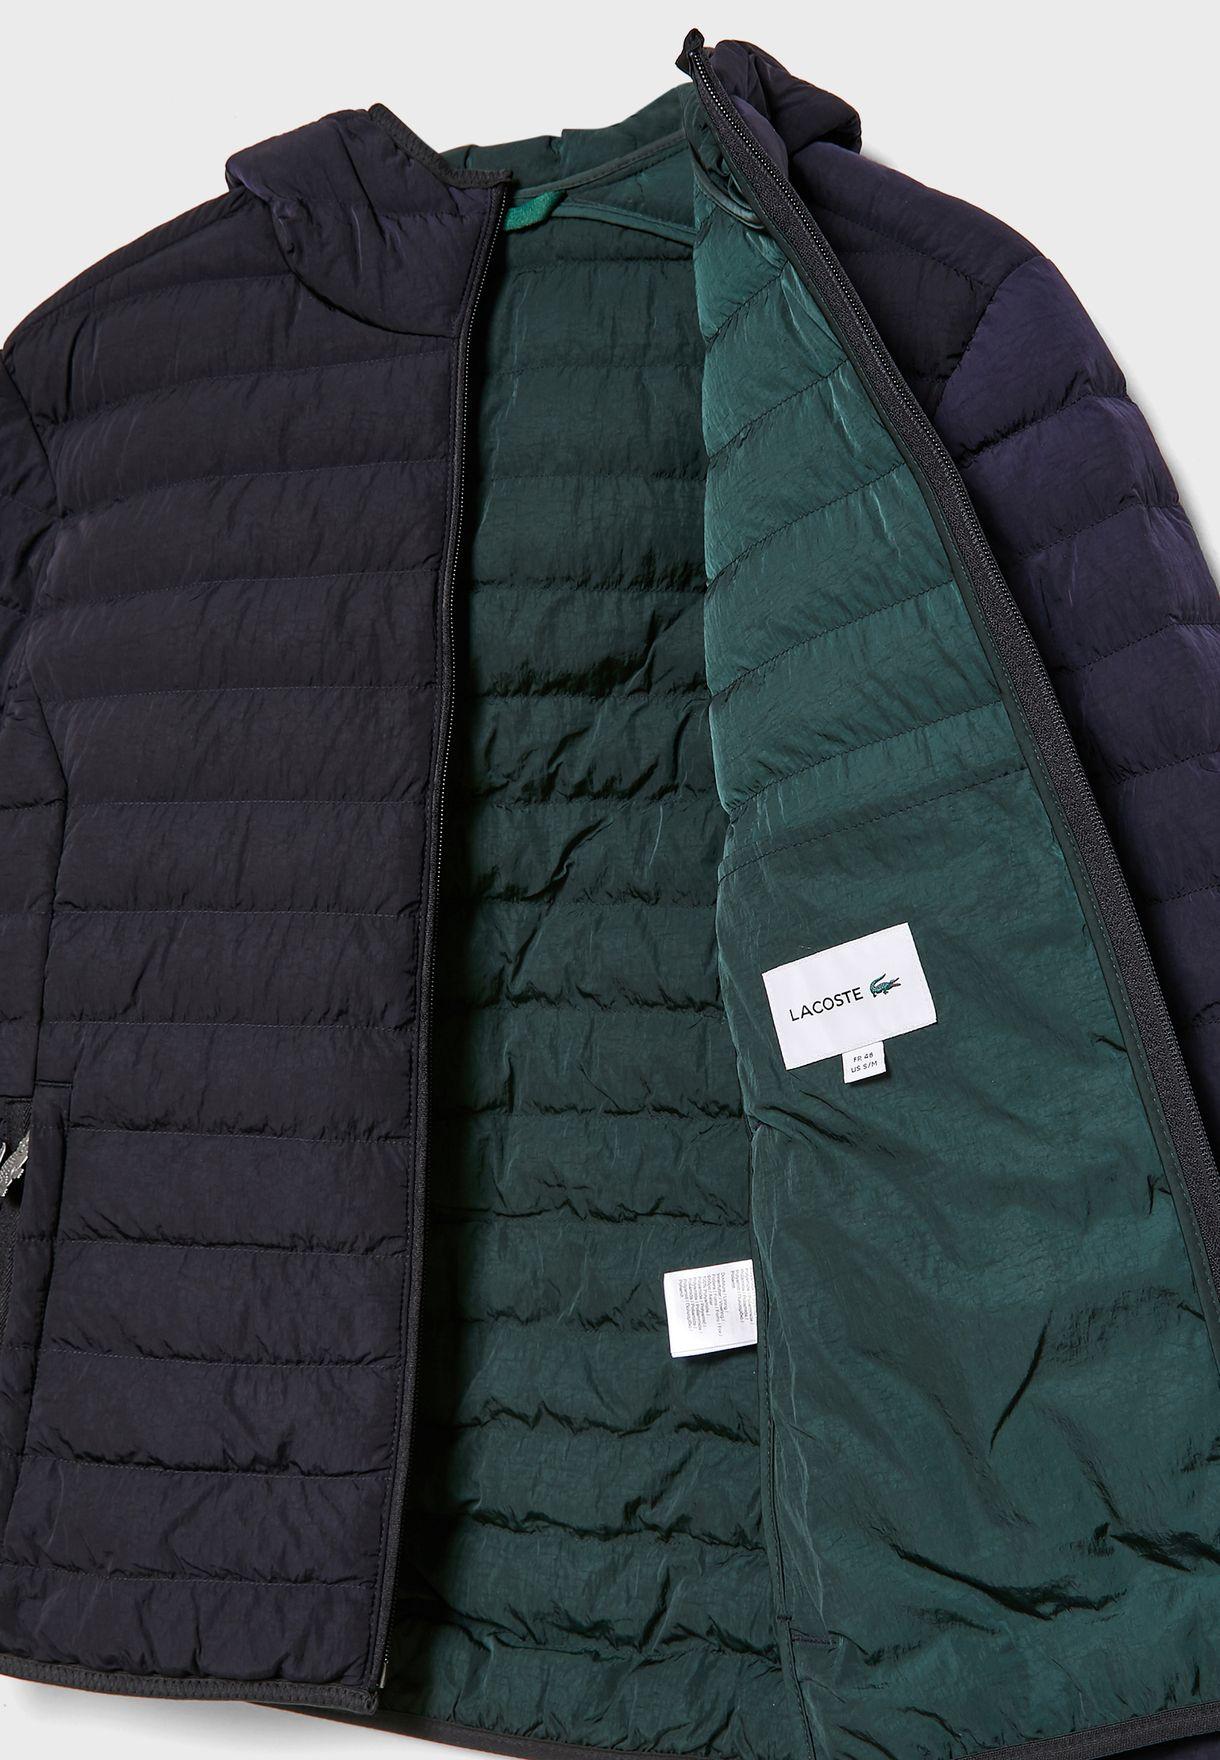 Foldable Hooded Water Resistant Jacket